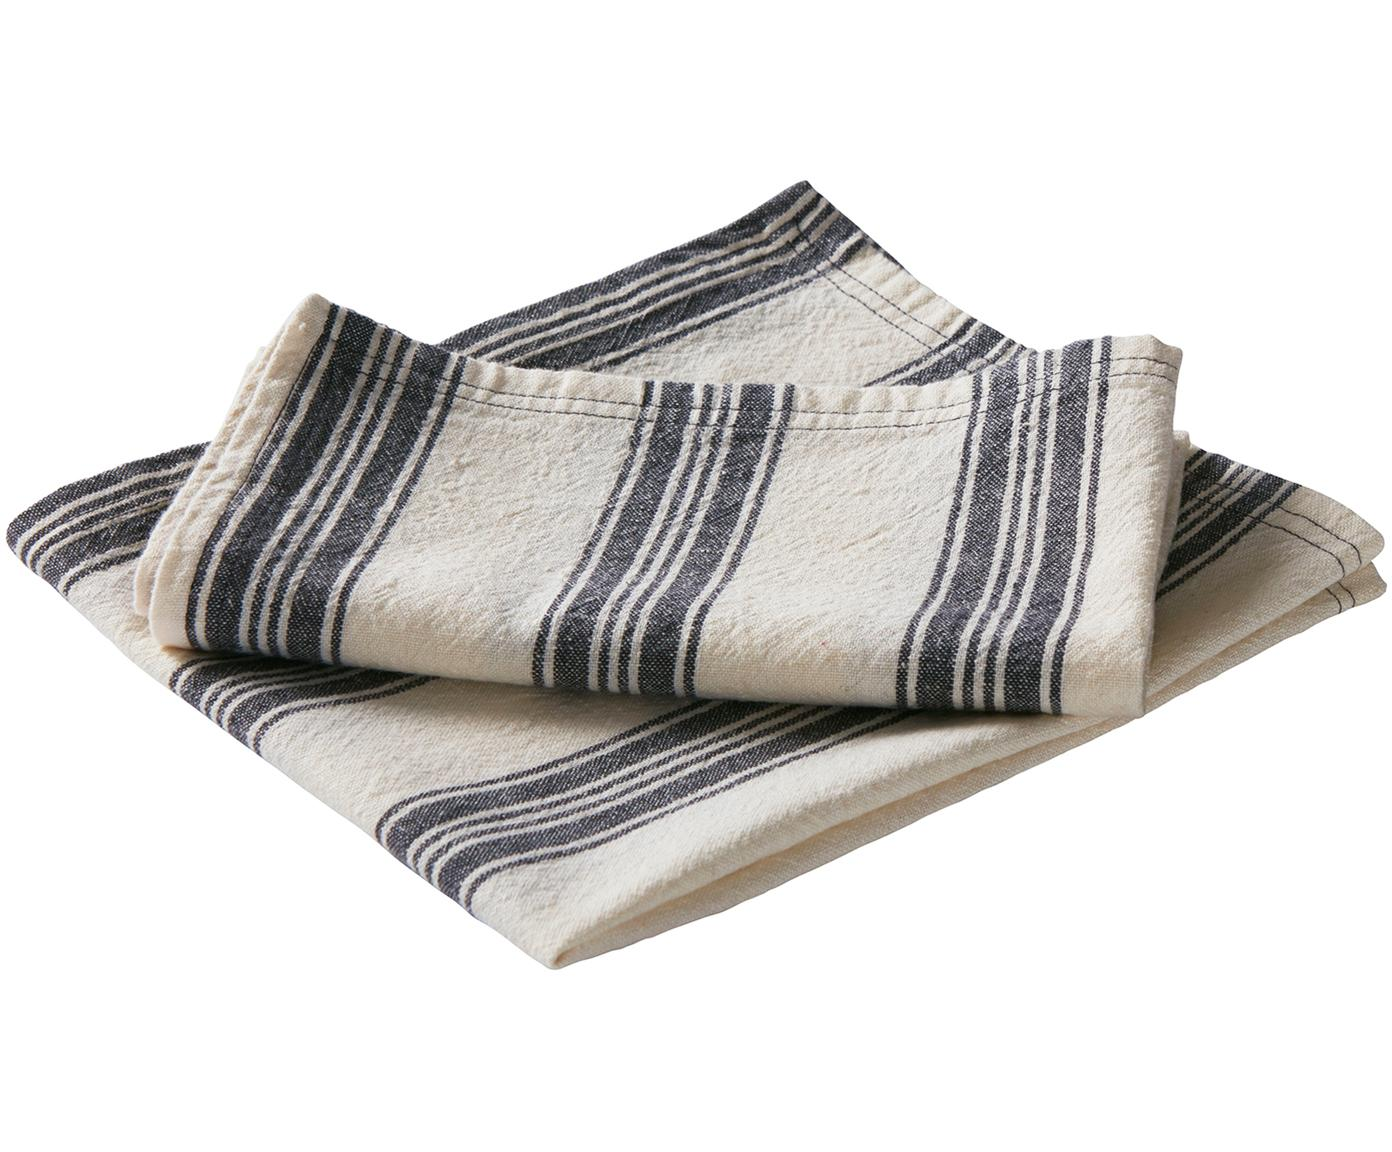 Servetten Abigail, 2 stuks, 80% katoen, 20% linnen, Gebroken wit, blauw, 45 x 45 cm